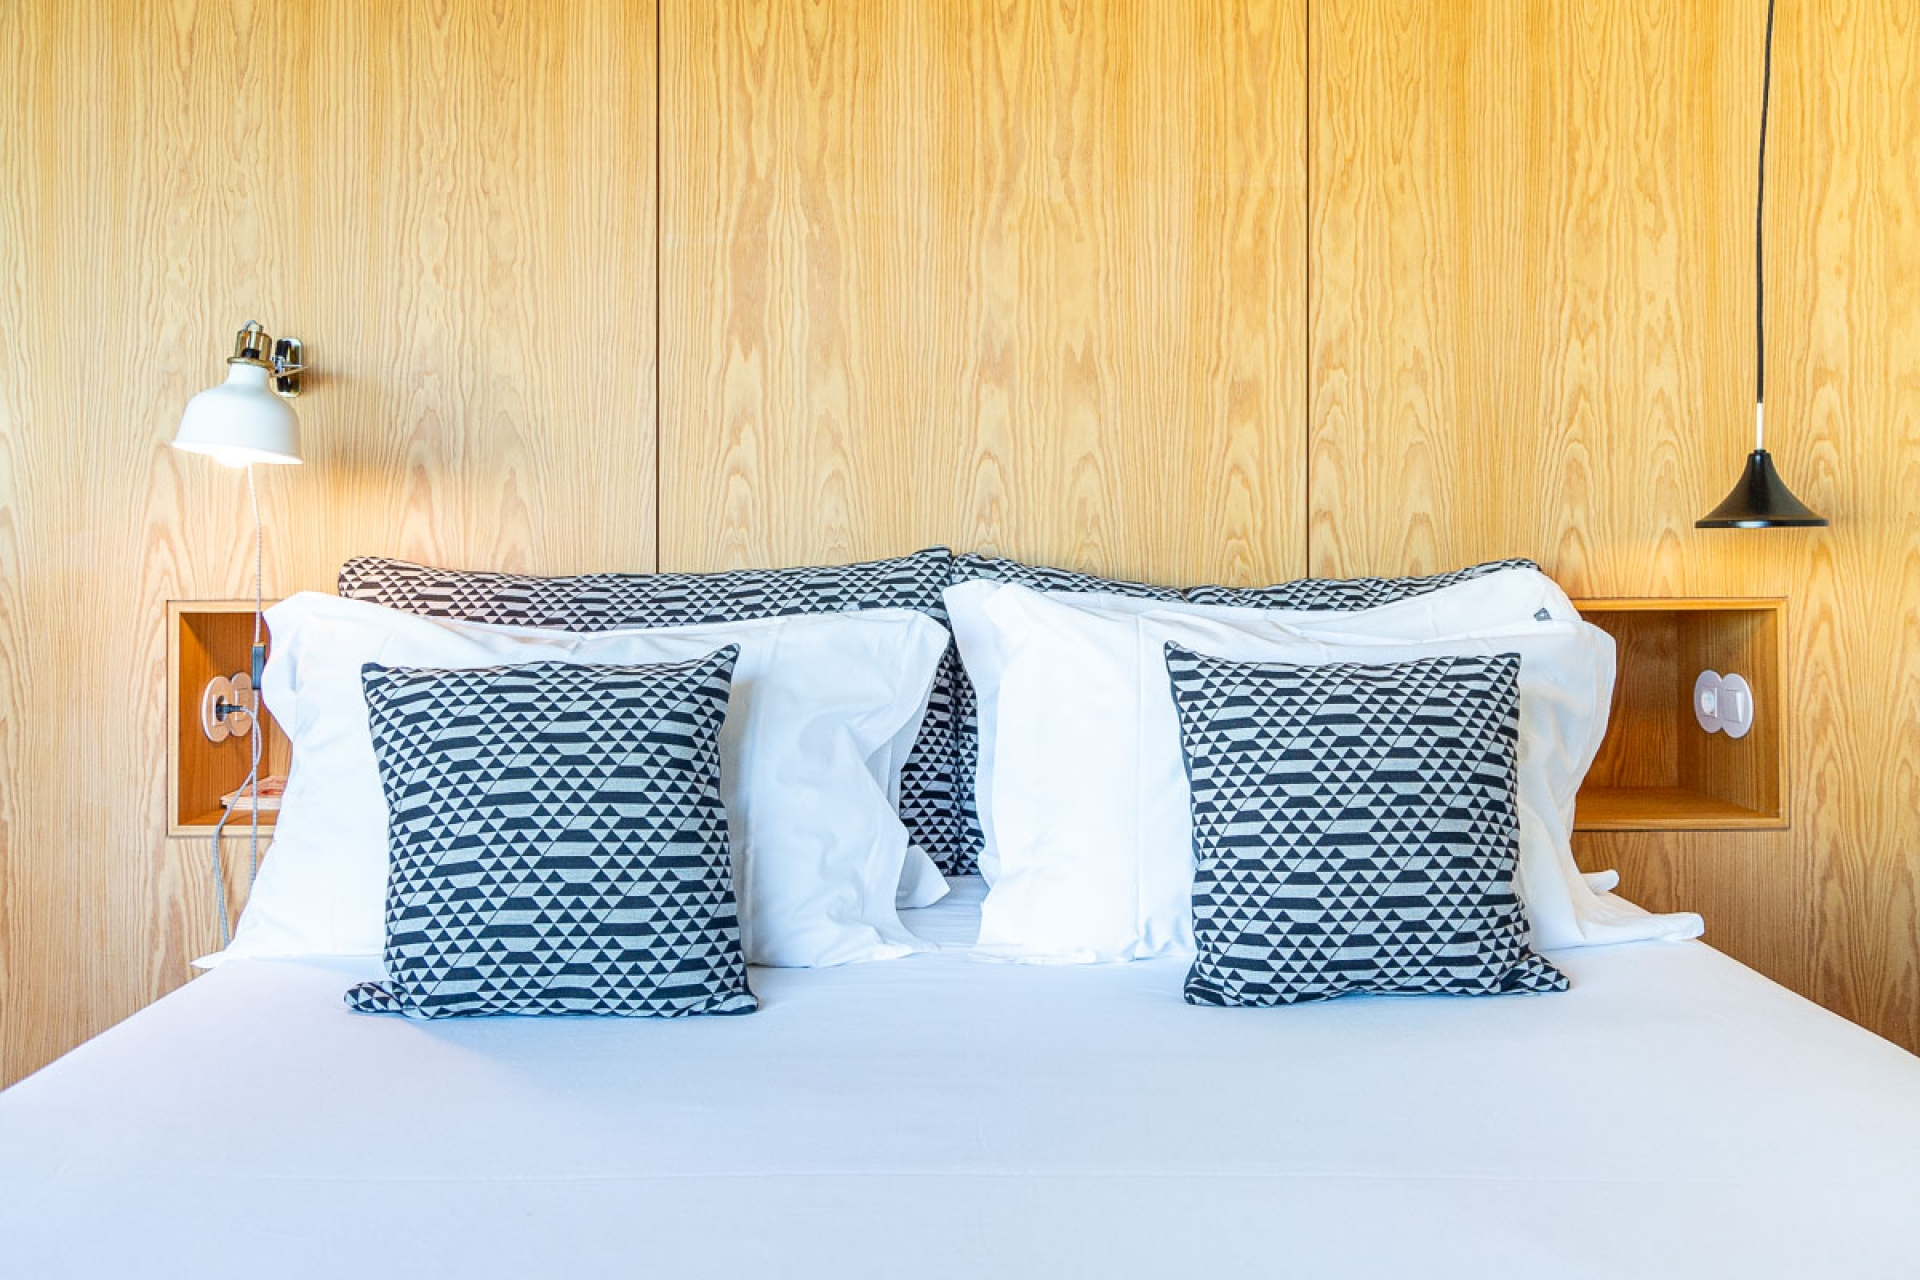 PortoCool_Dormir_Baumhaus_Serviced_Apartments